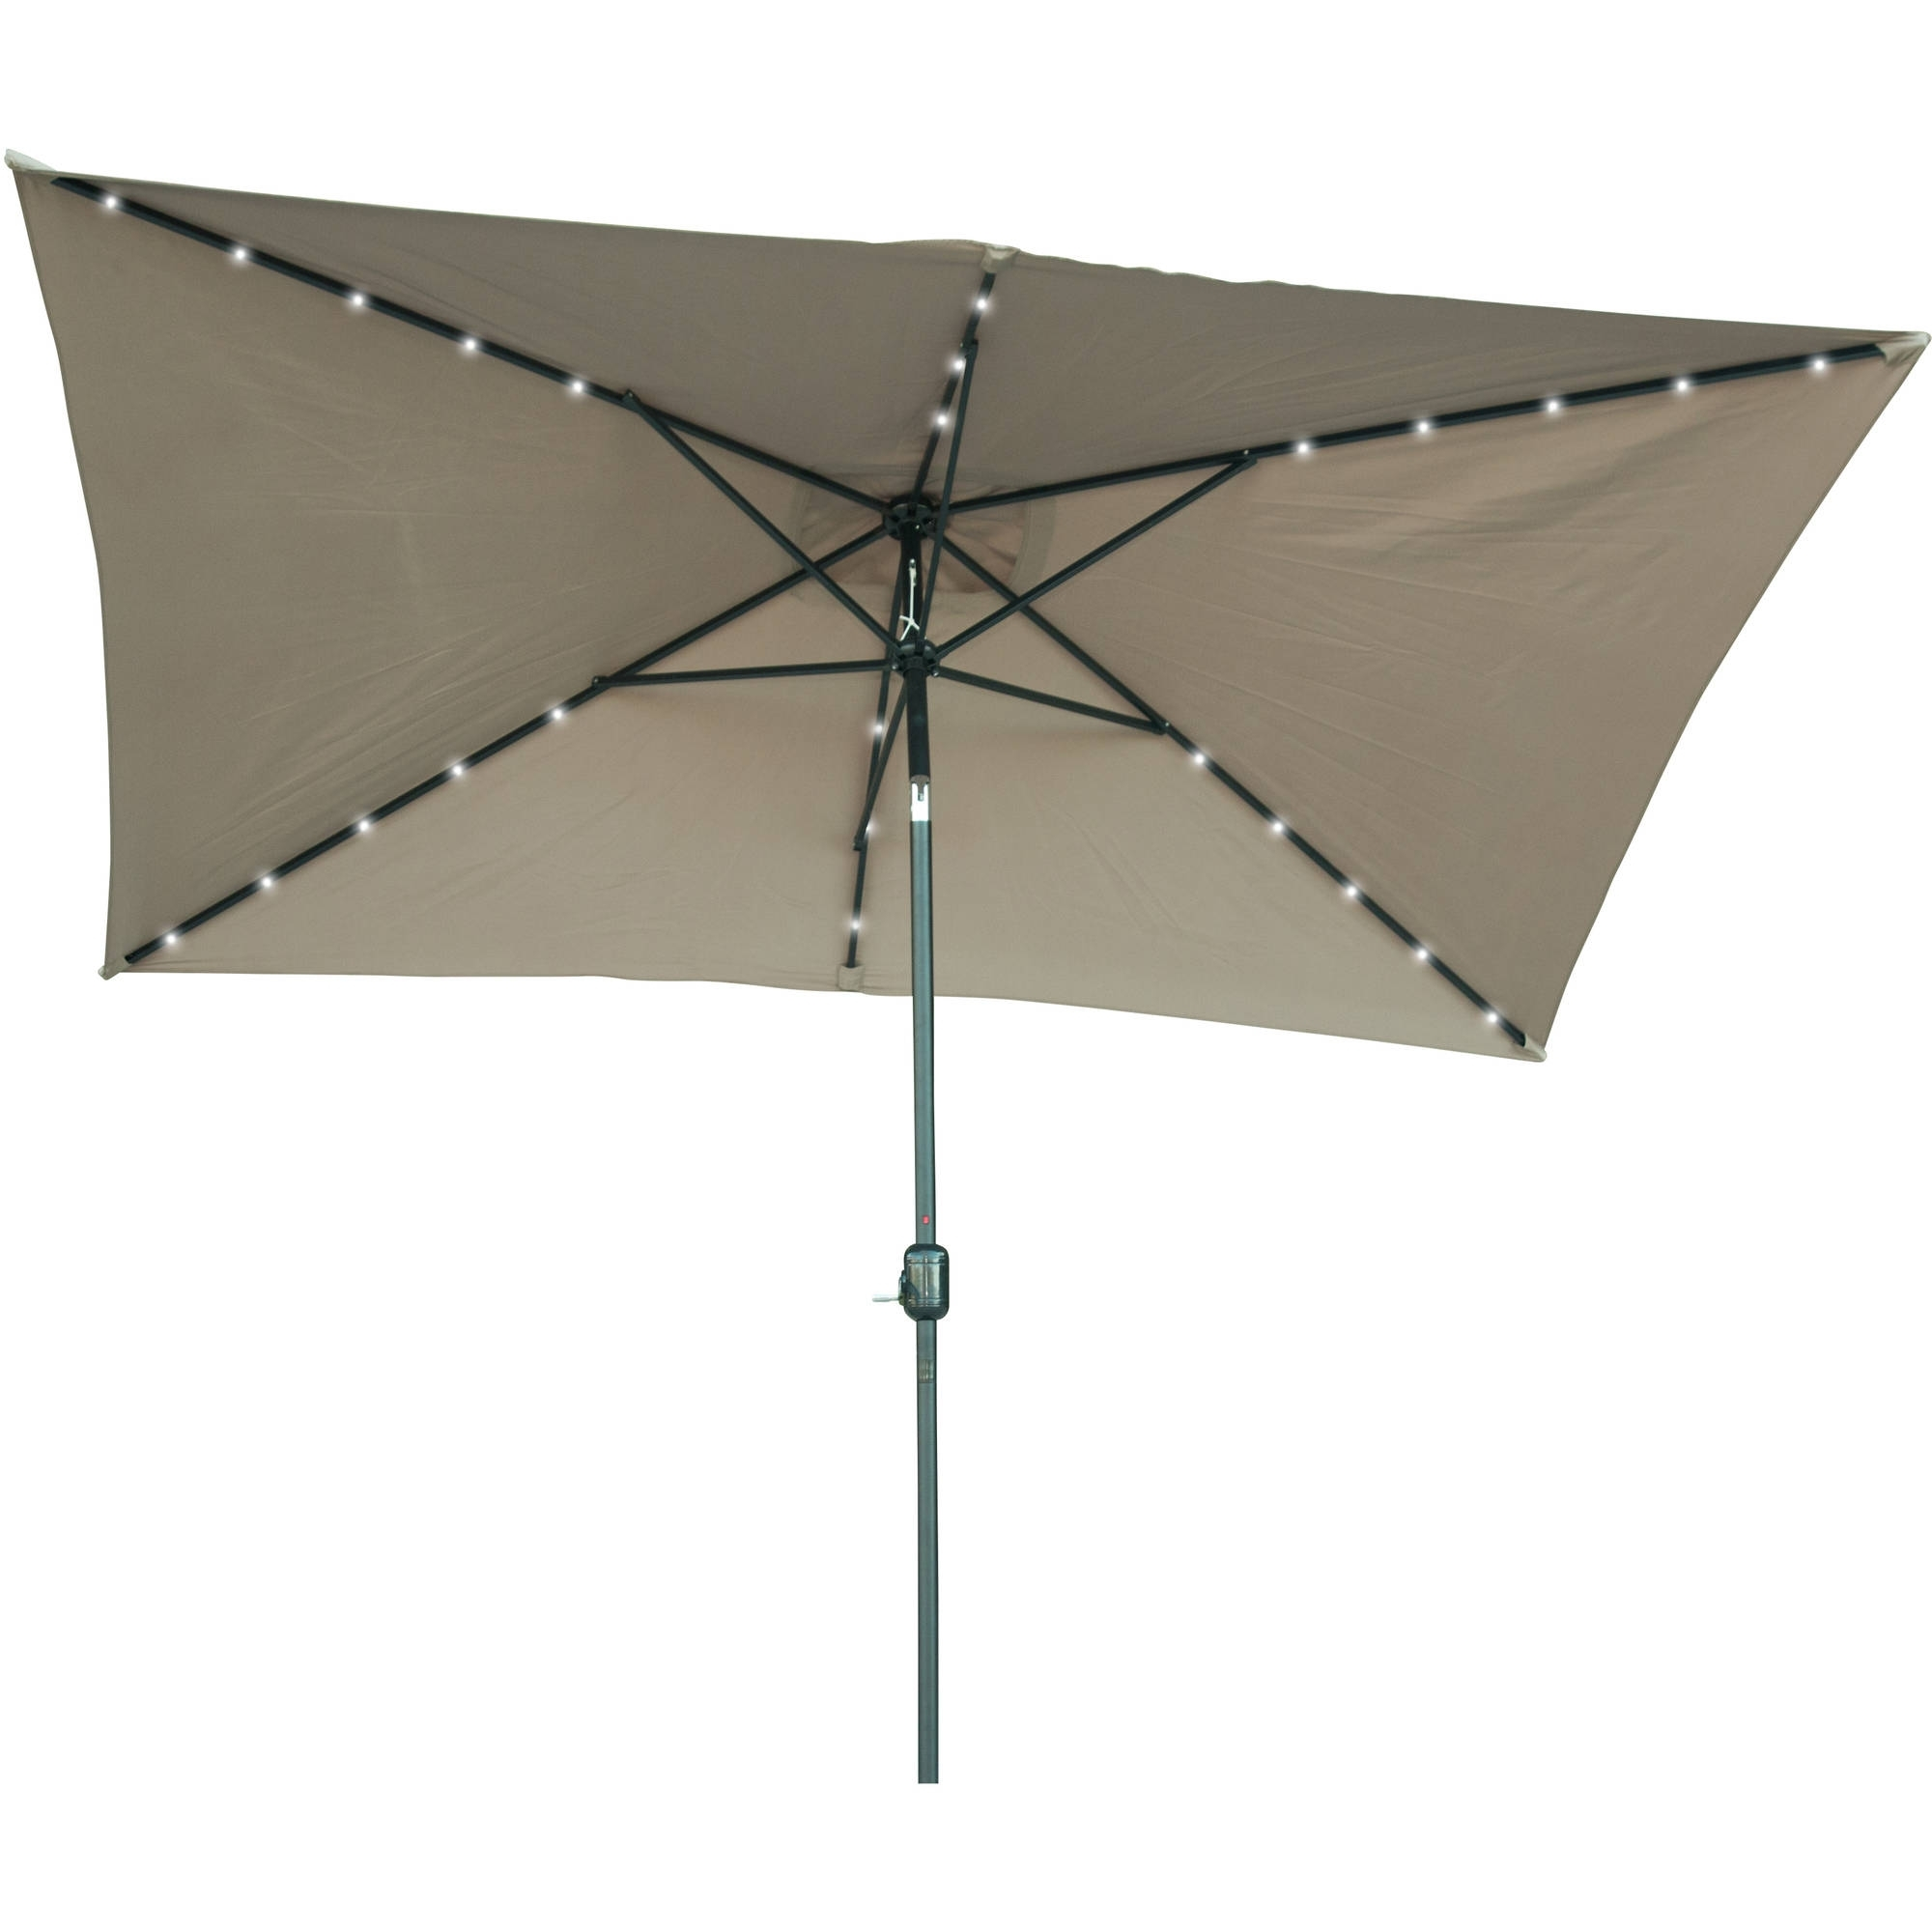 Most Popular Lighted Patio Umbrellas Pertaining To Rectangular Solar Powered Led Lighted Patio Umbrella – 10' X (View 3 of 20)